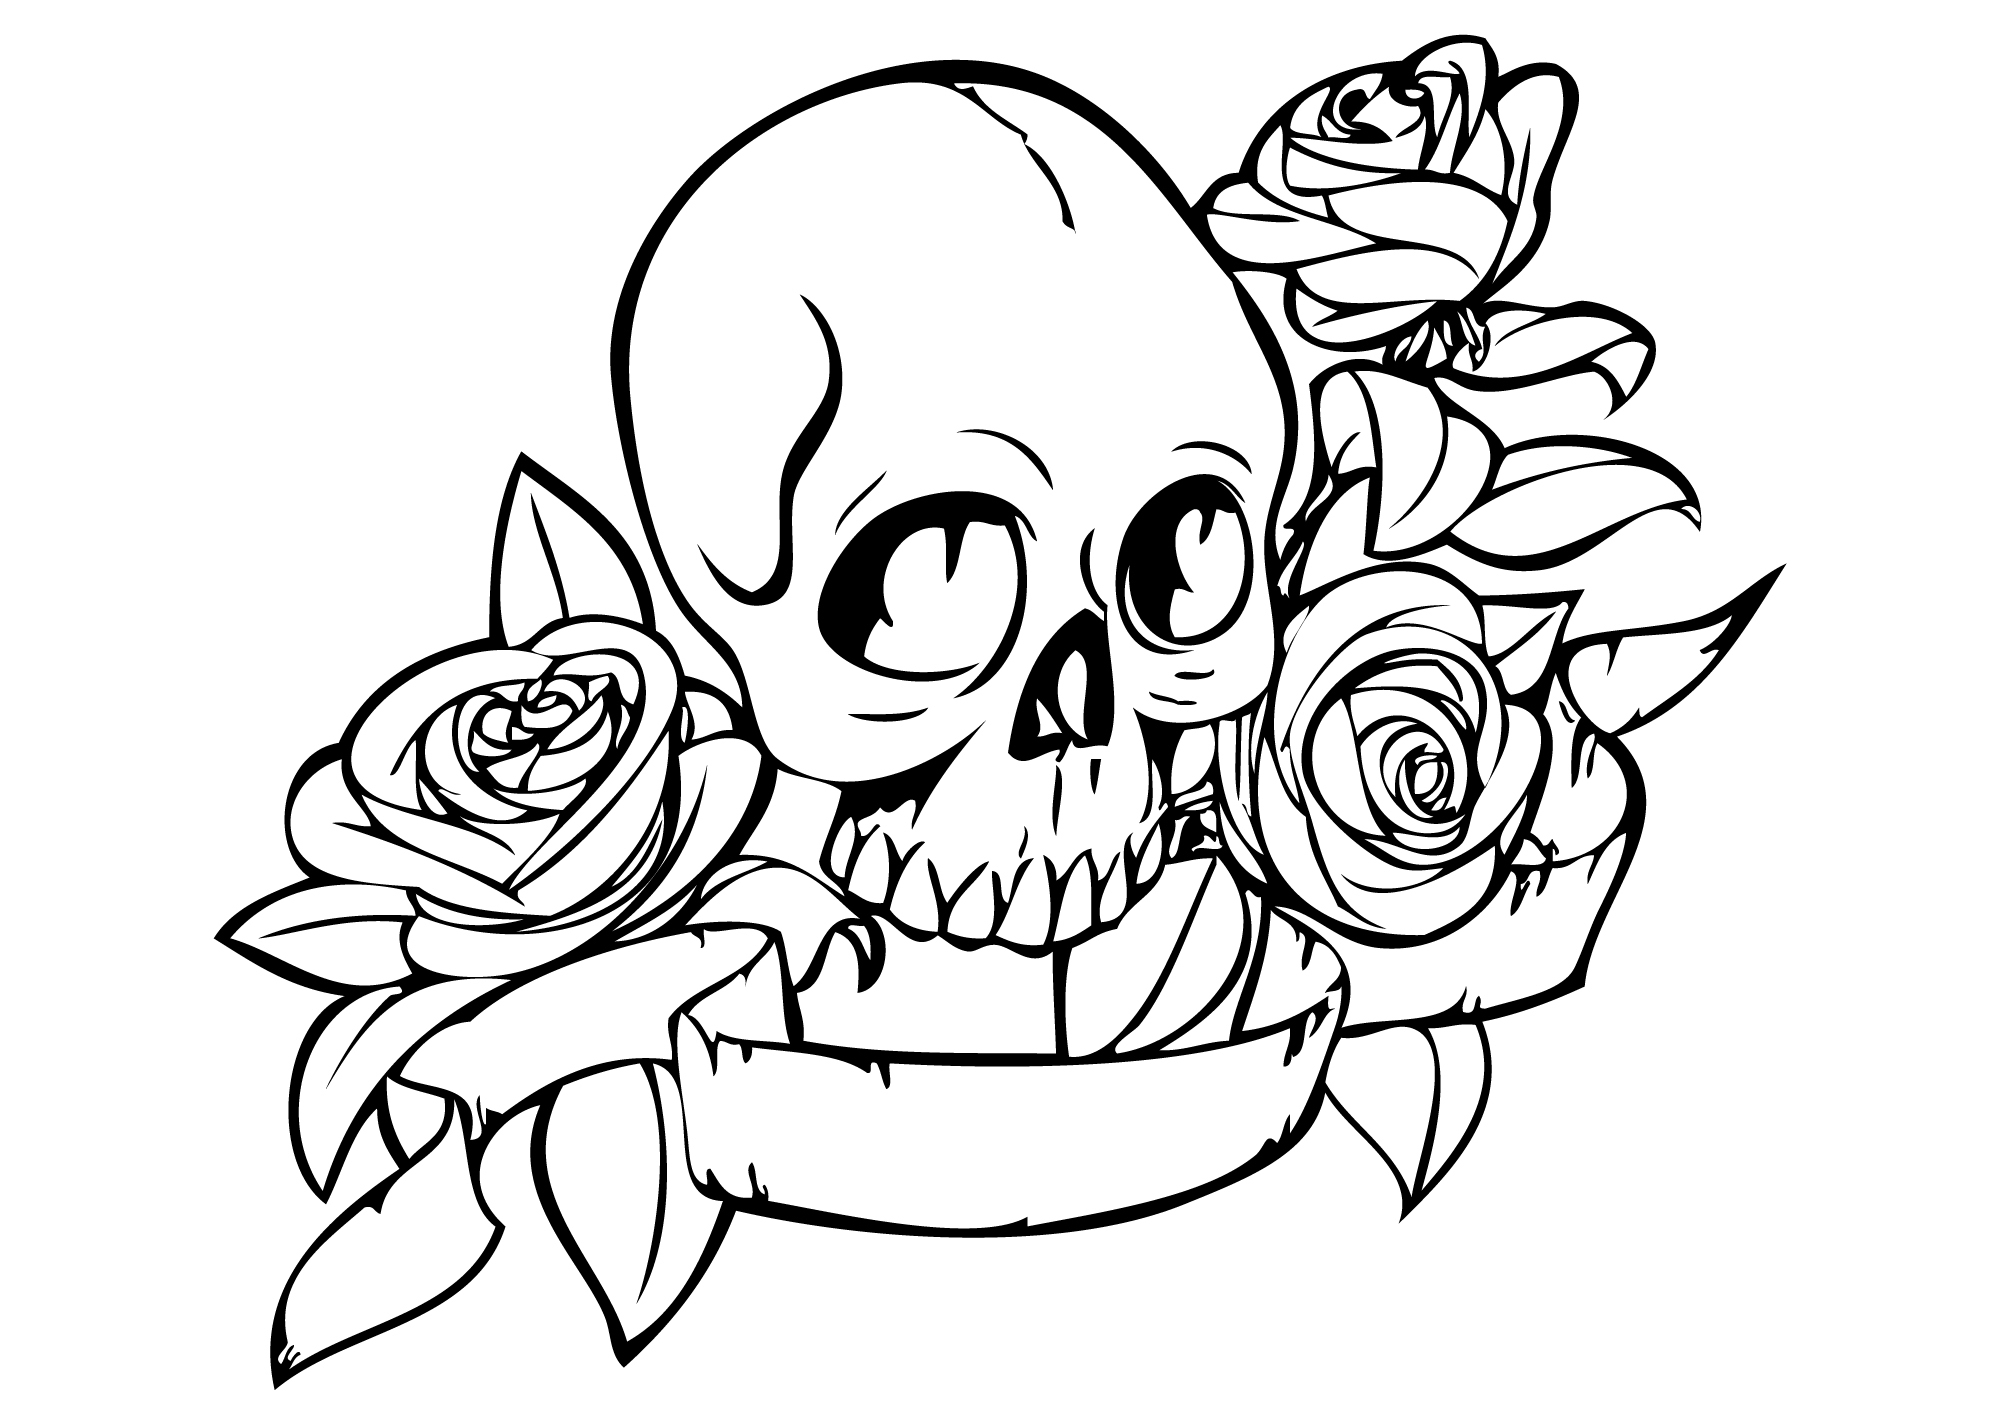 Skulls Drawing At GetDrawings.com